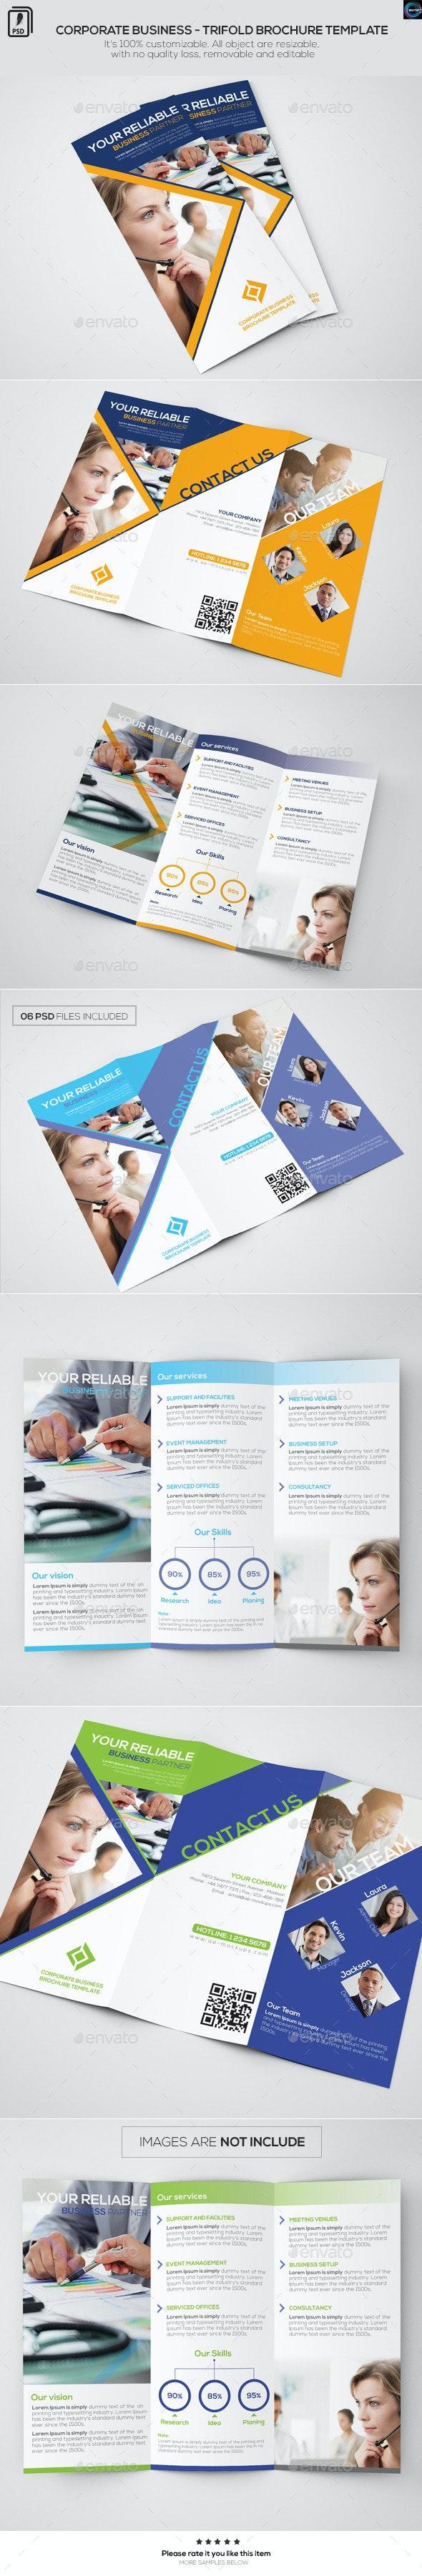 Corporate Business - Trifold Brochure Template - Corporate Brochures